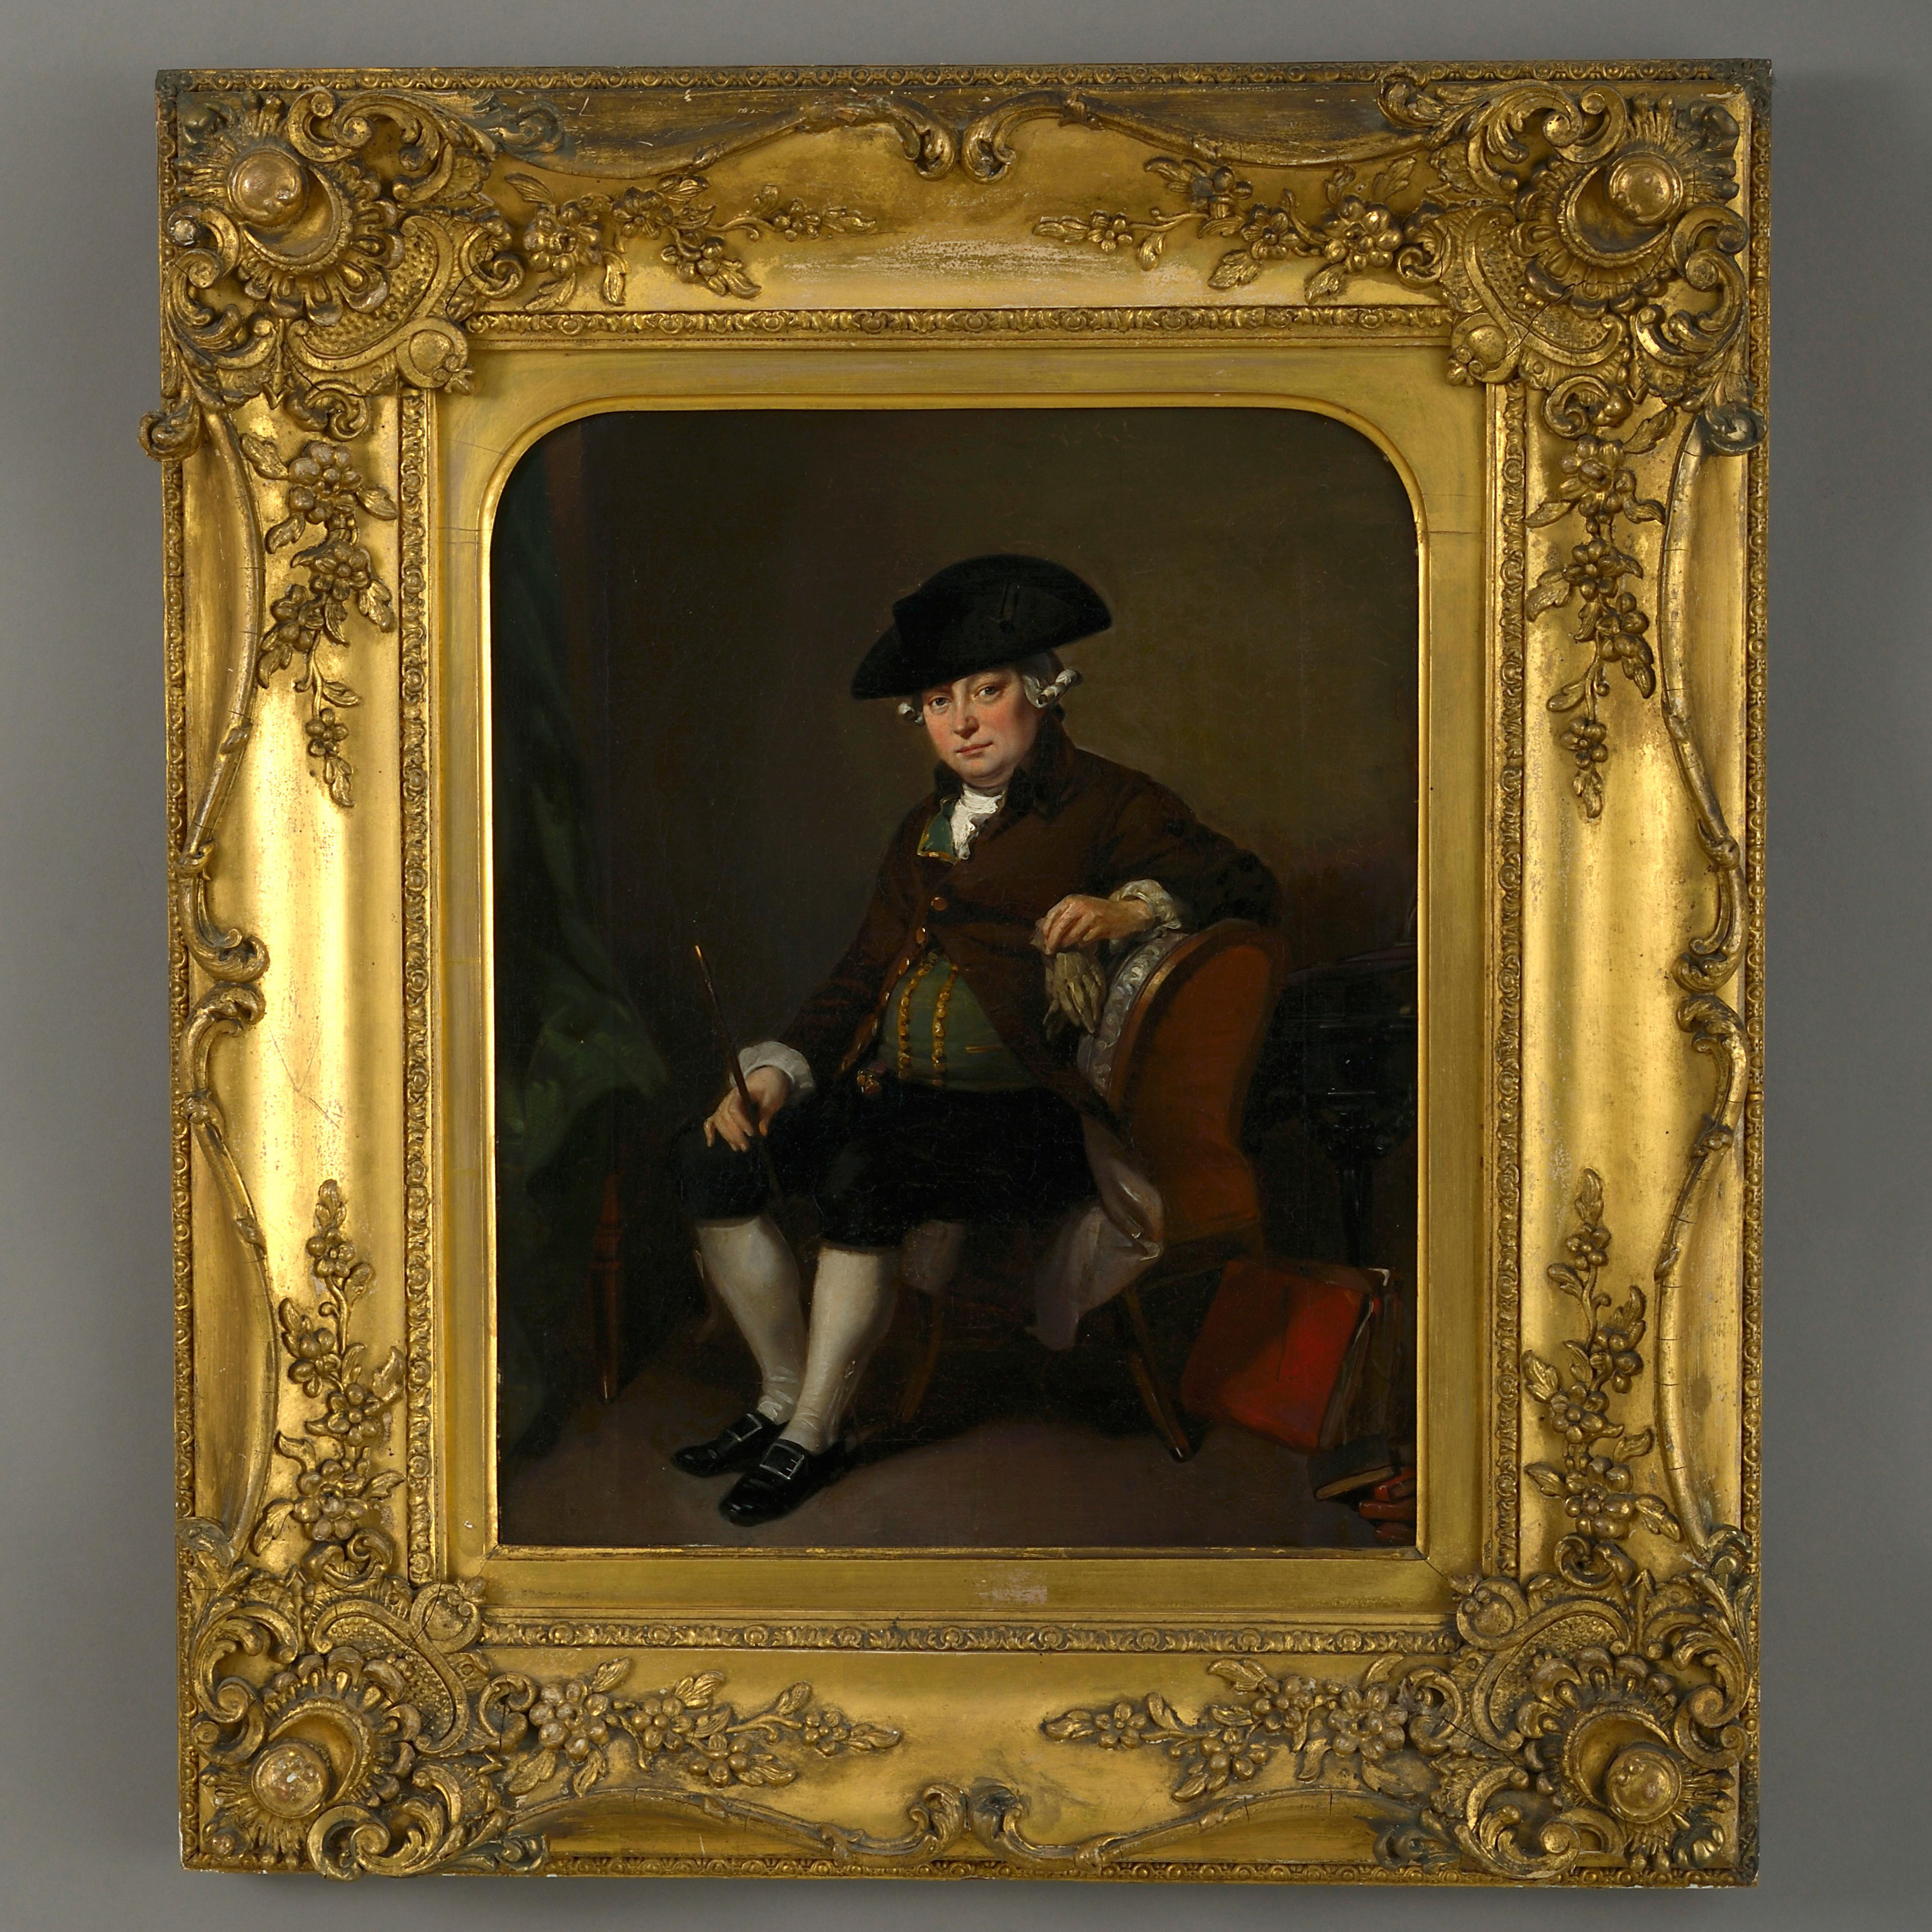 Follower of Samuel de Wilde, Portrait of an Actor in Character